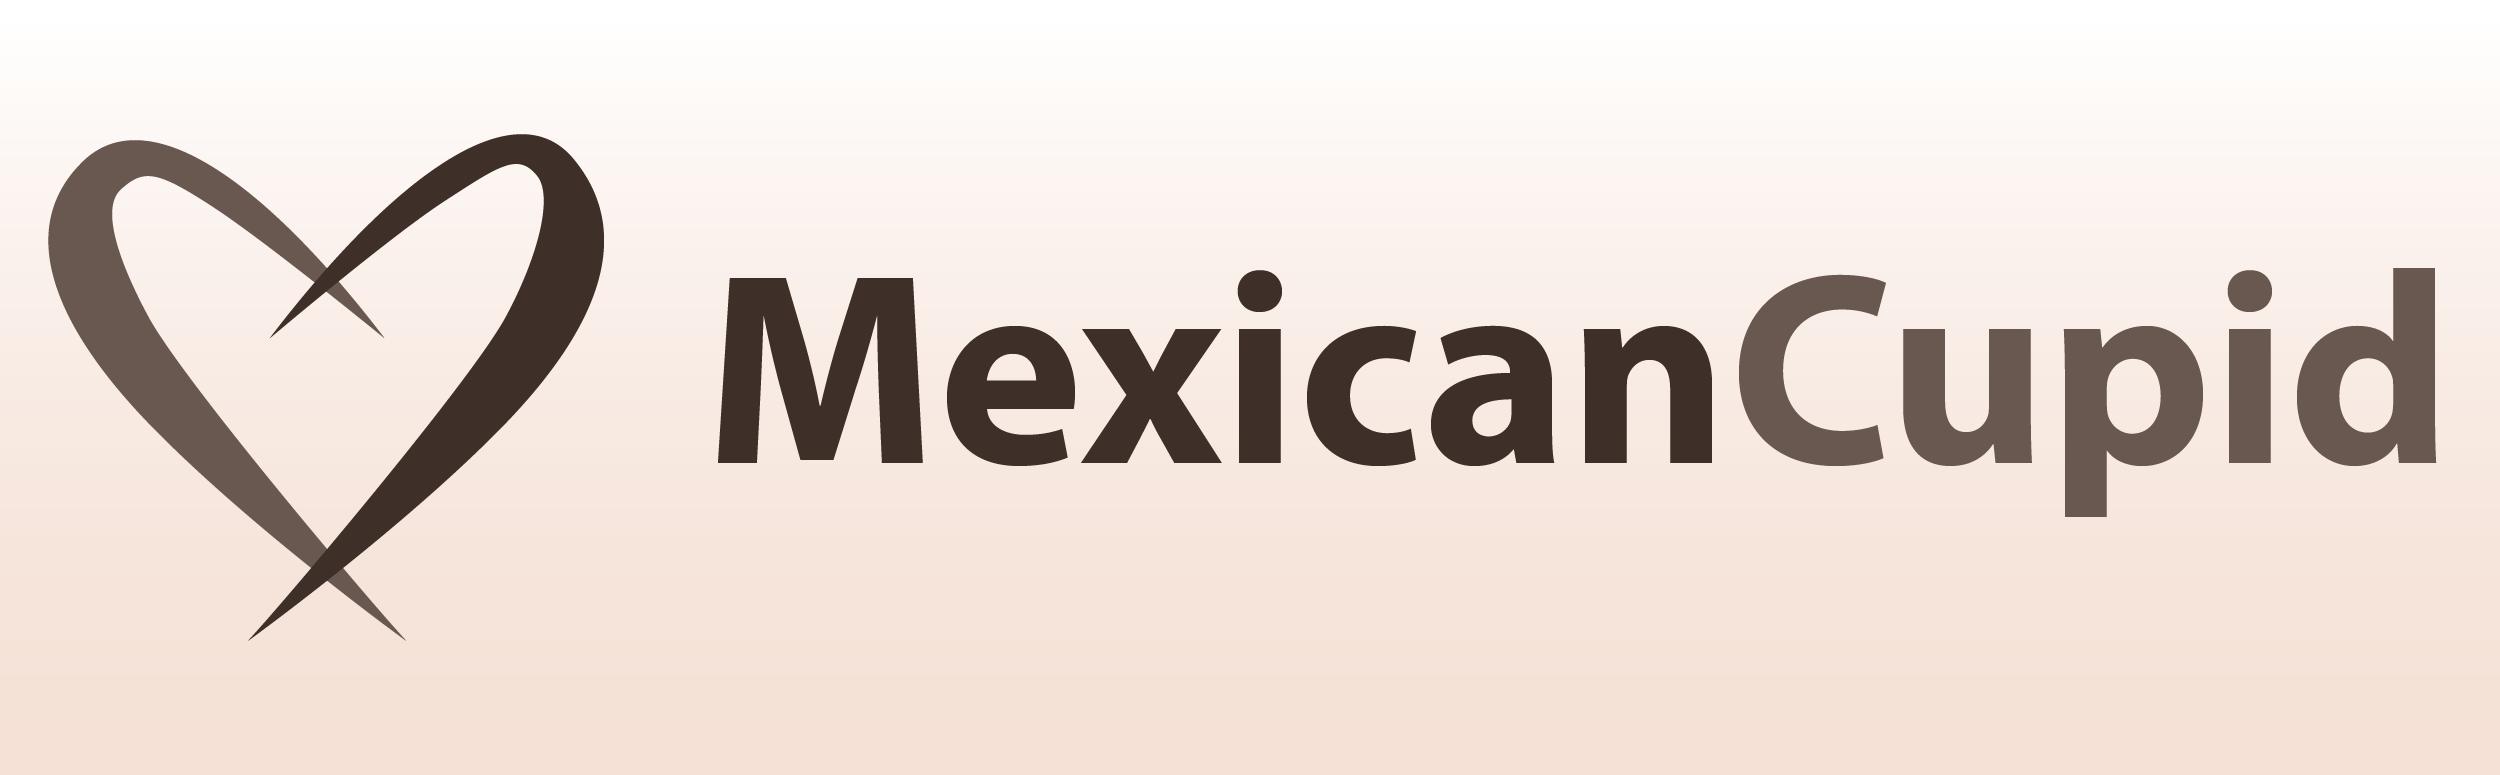 Mexican cupid login